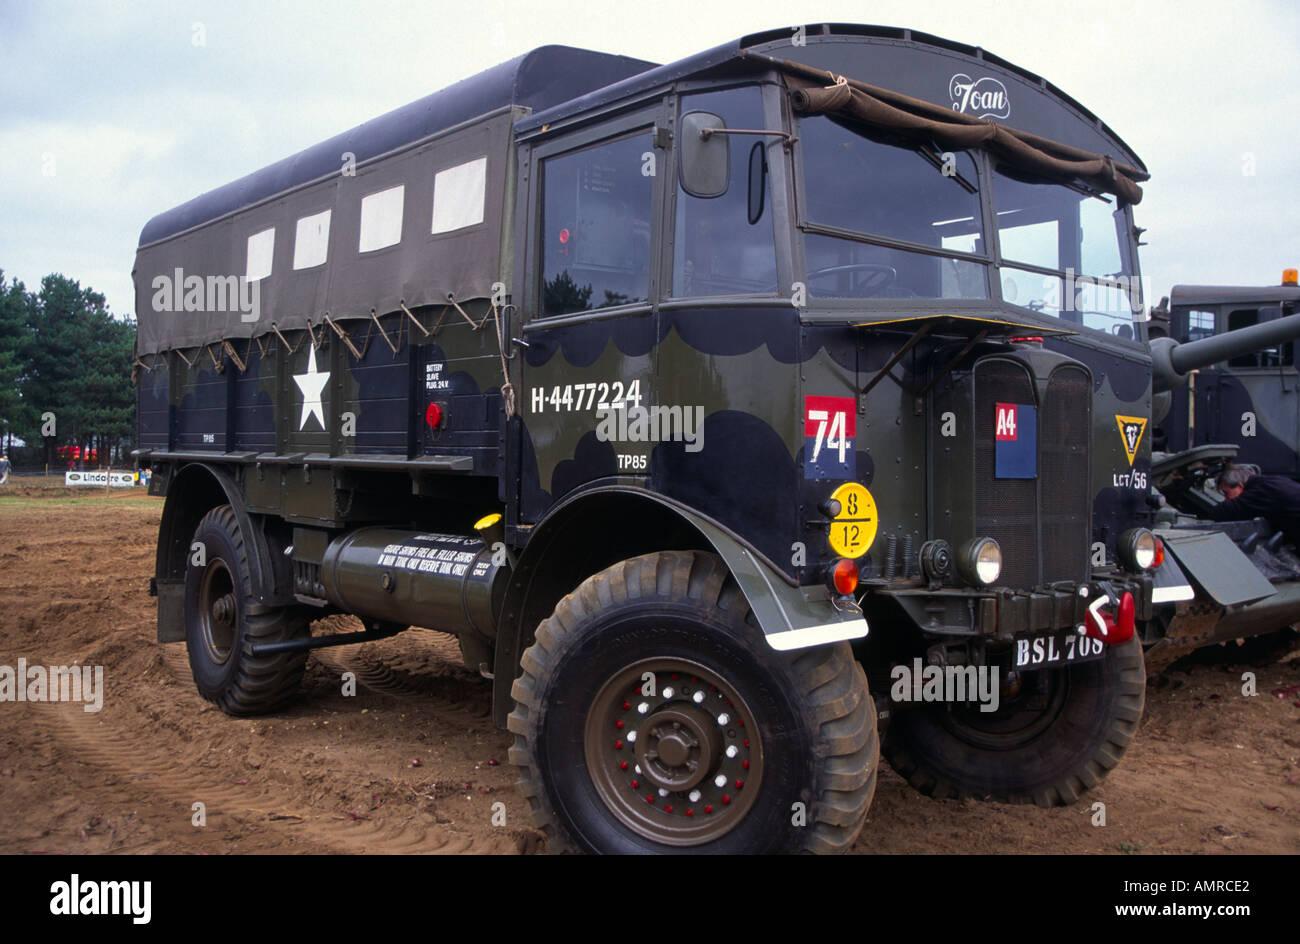 Old USA military transport vehicle - Stock Image